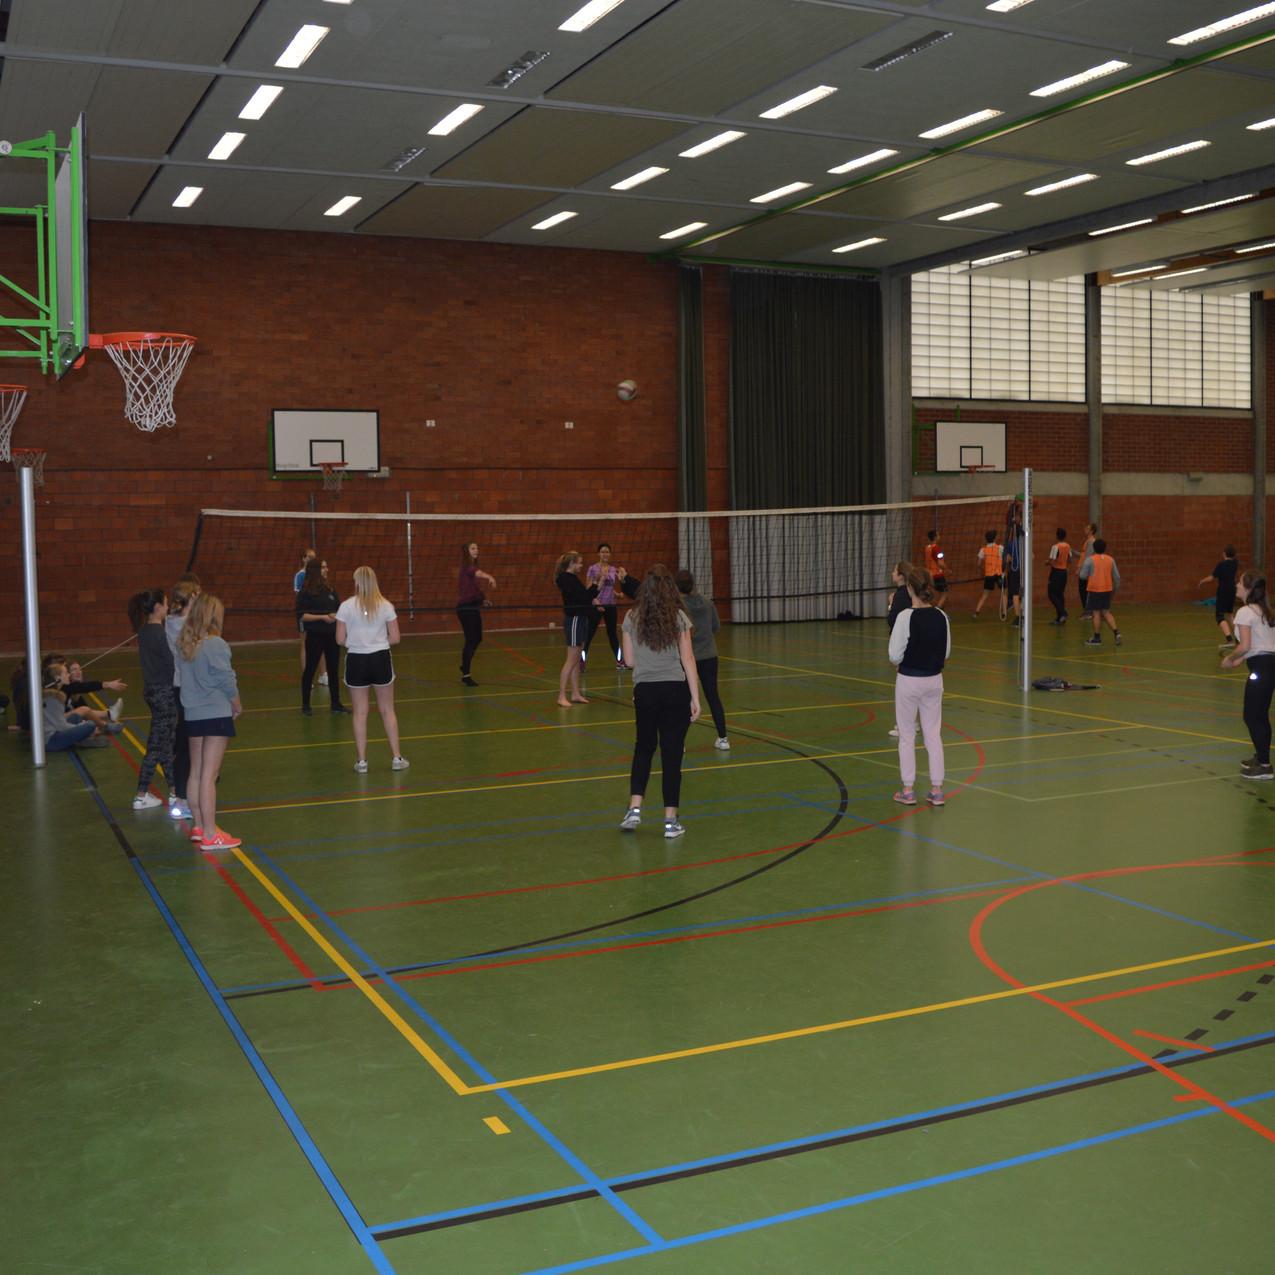 20171207 examensport (2)